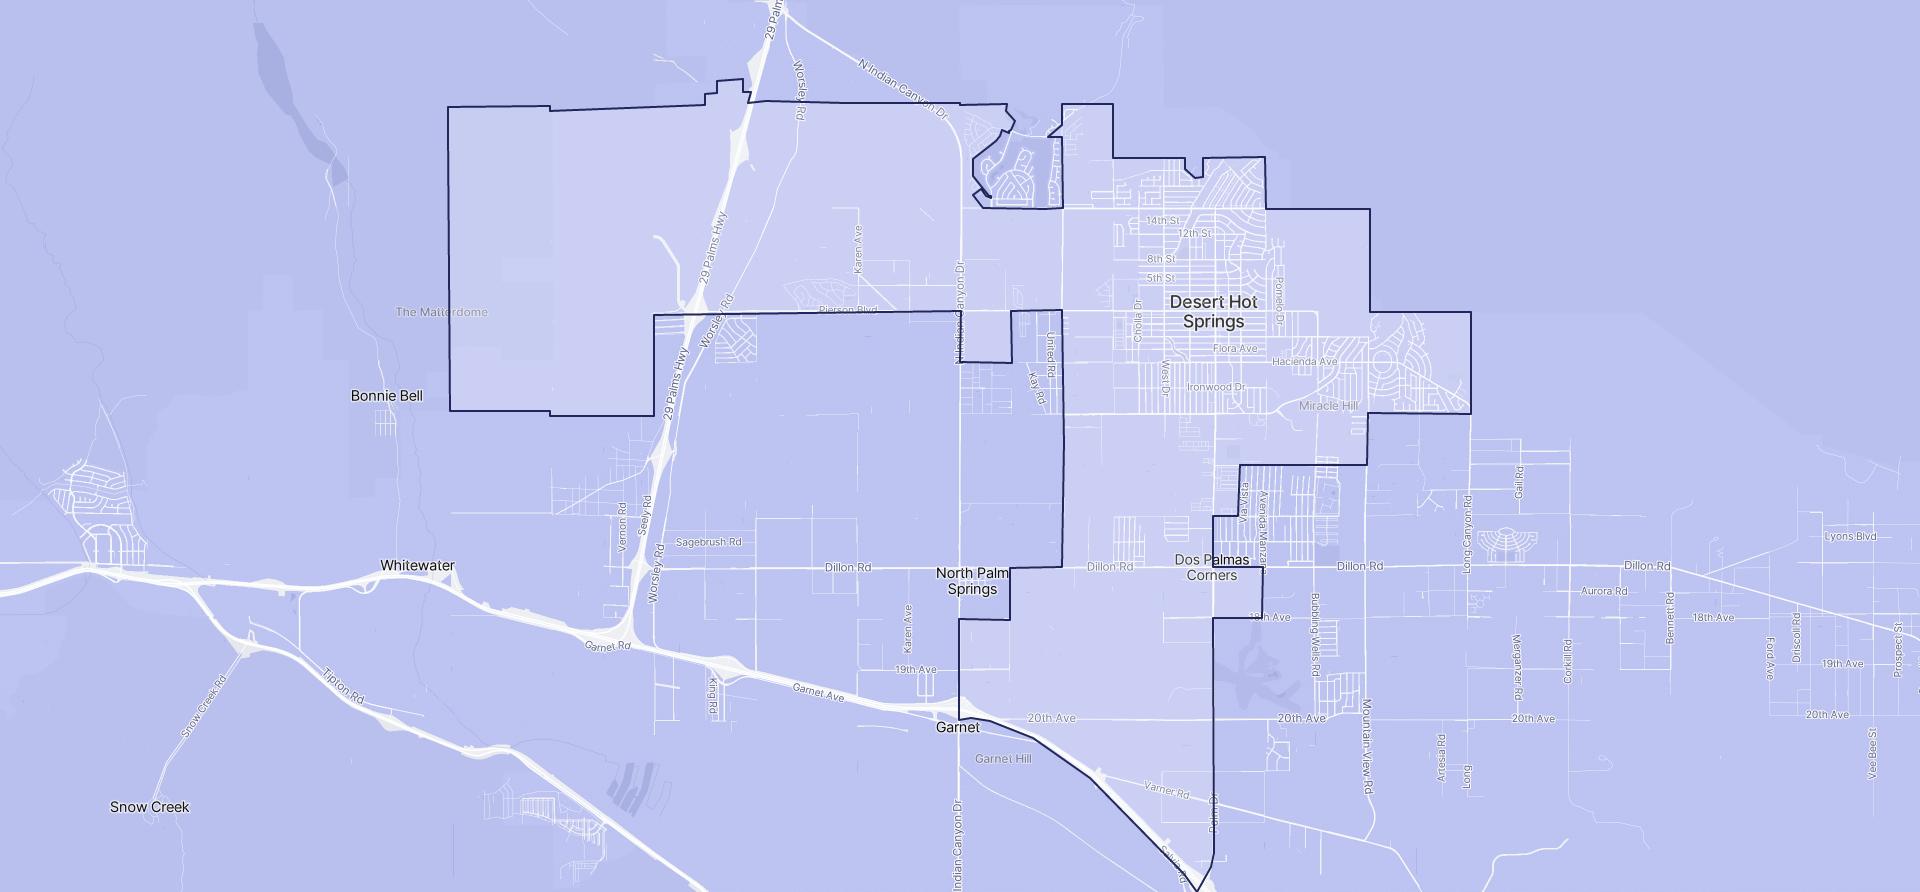 Image of Desert Hot Springs boundaries on a map.